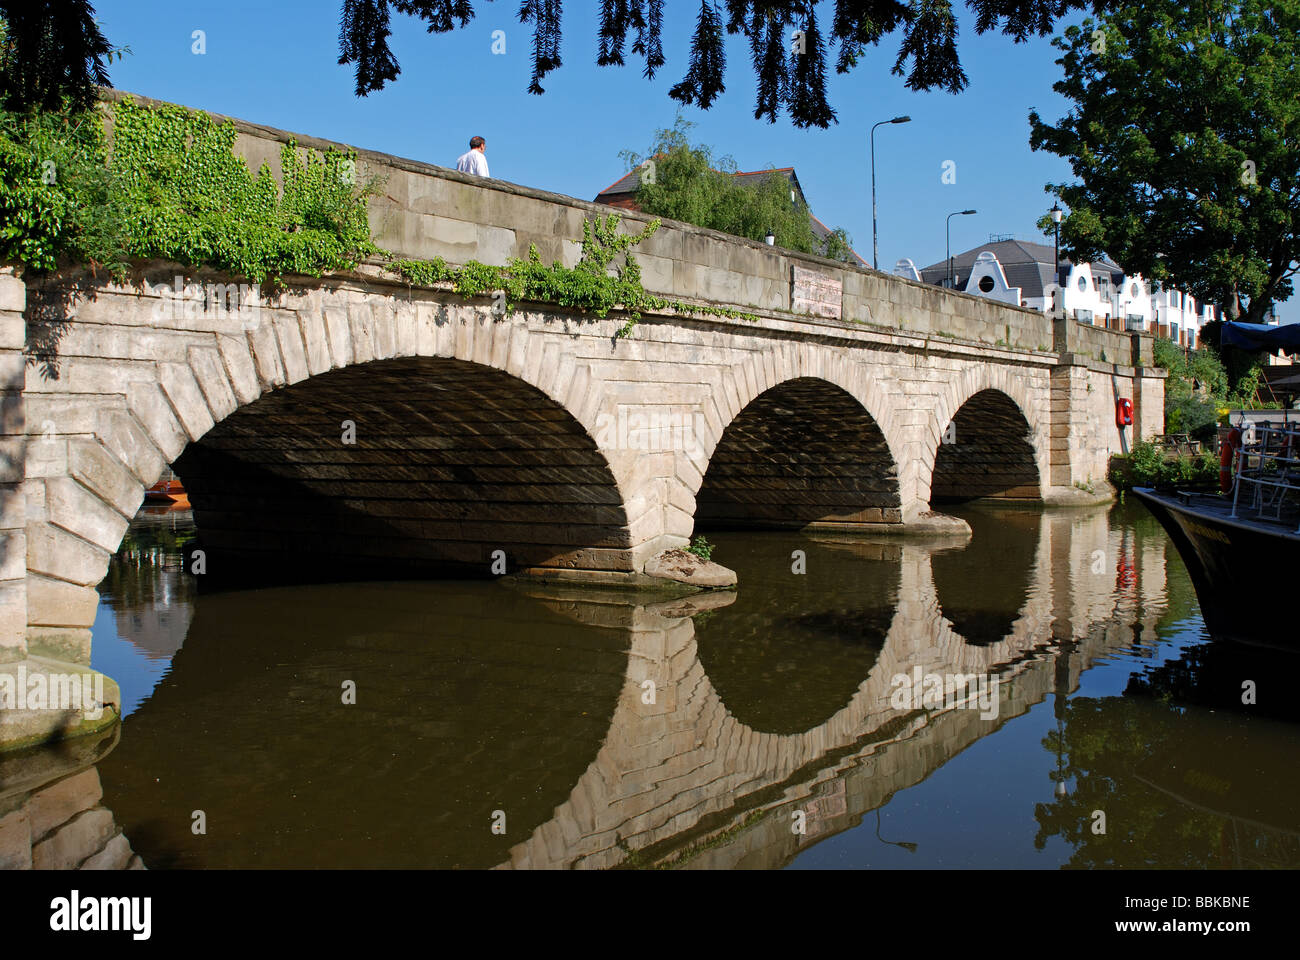 Folly Bridge and River Thames, Oxford, Oxfordshire, England, UK Stock Photo